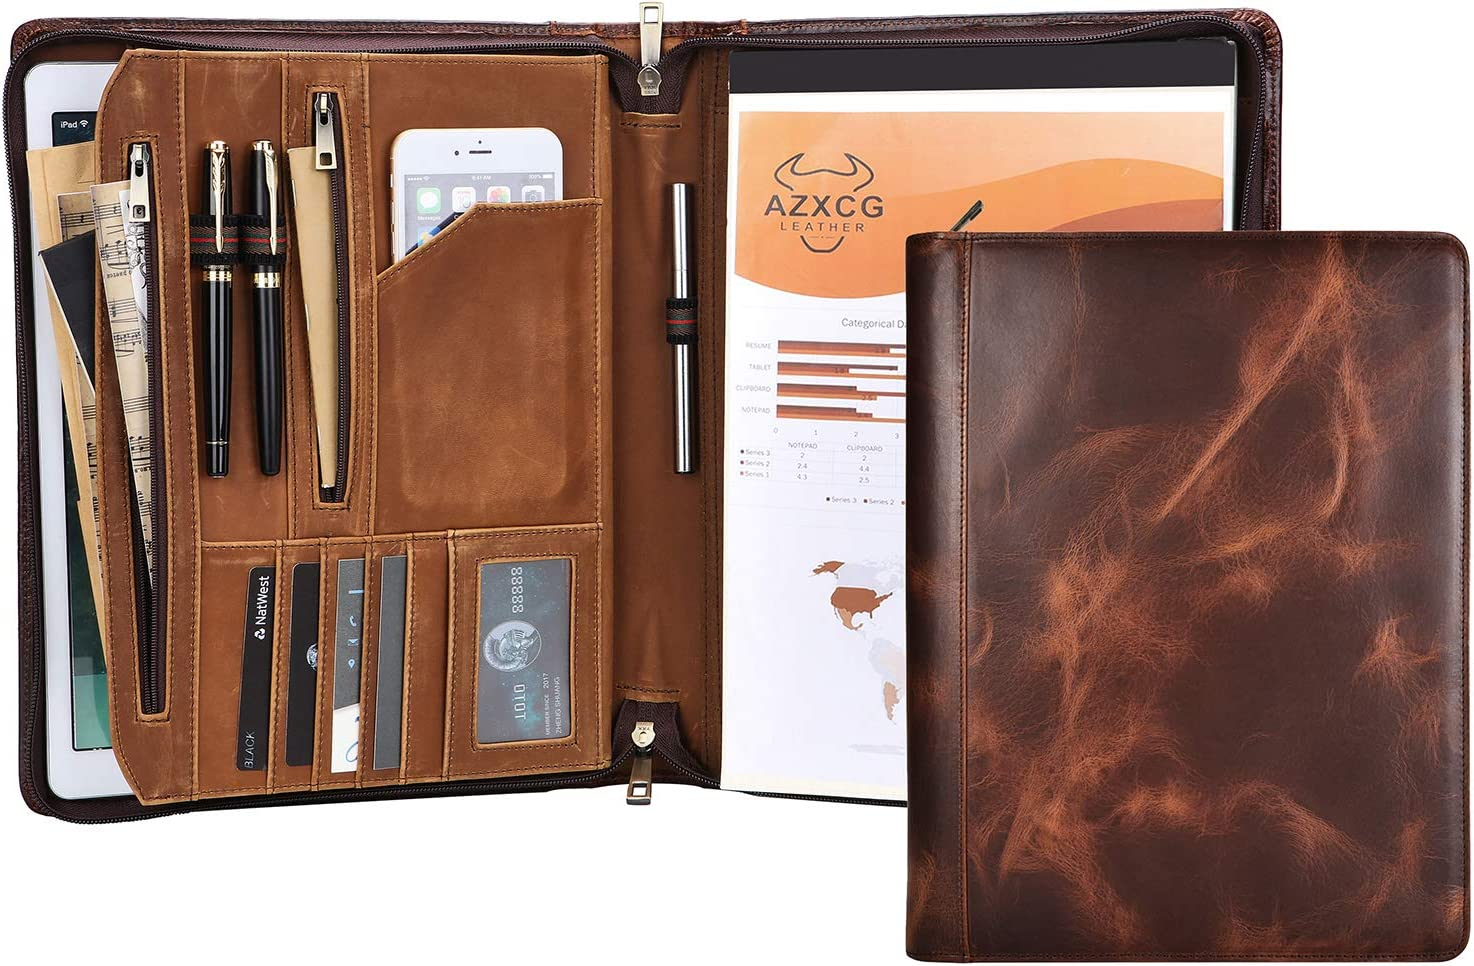 AZXCG Professional Leather Portfolio Padfolio, Zippered Business Organizer Tablet Folio Folder, for Business Men and Women (Non-Custom, Oil Tanned & Vintage Leather)